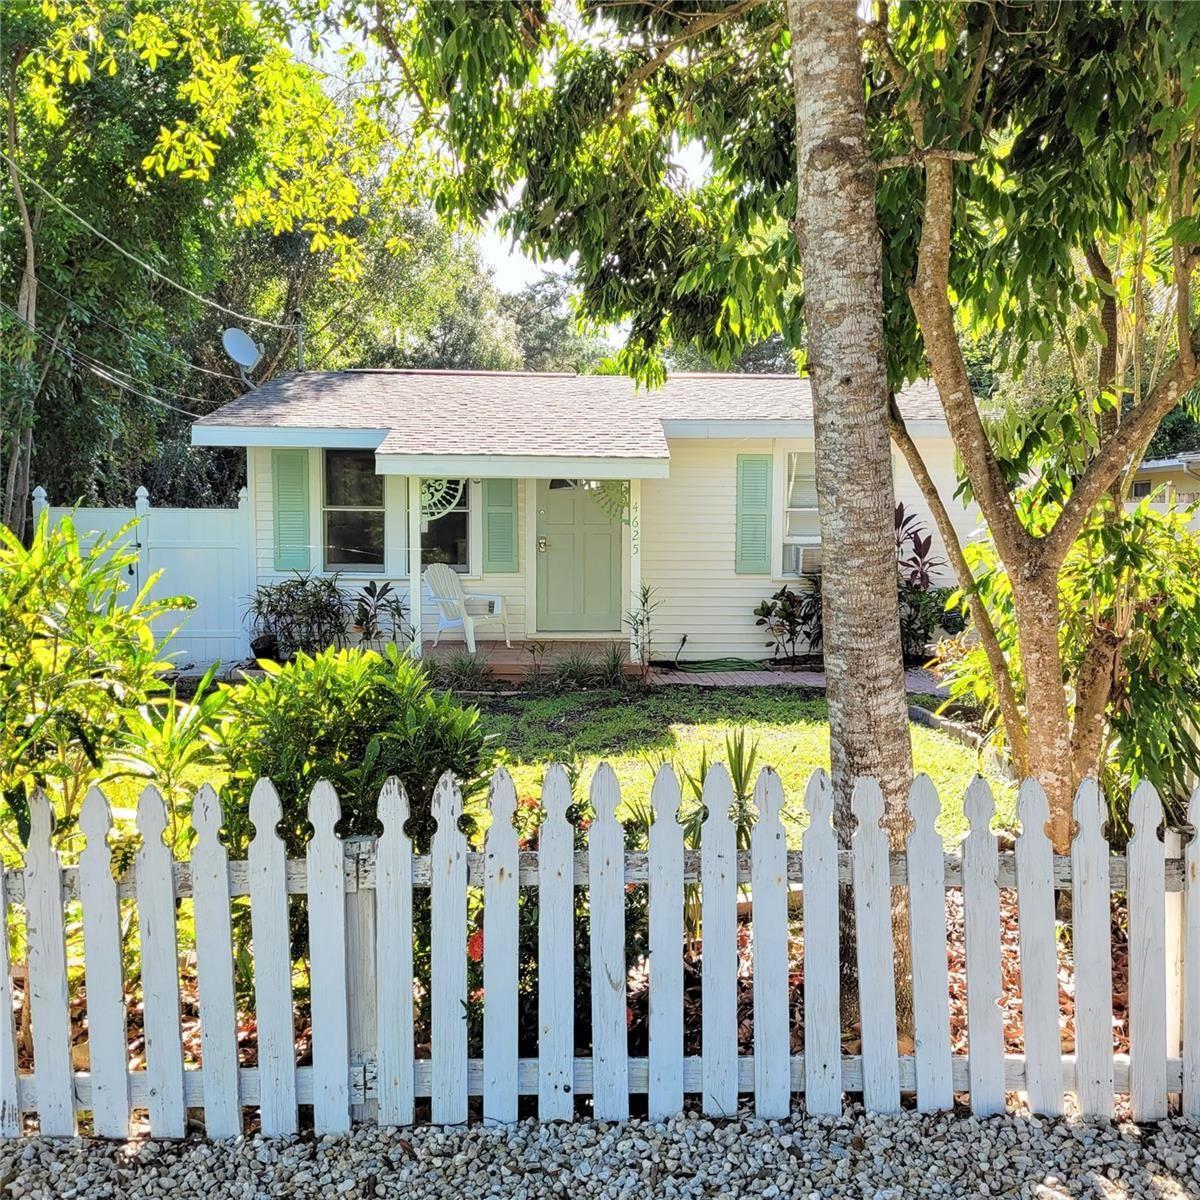 Photo of 4625 SLOAN AVENUE, SARASOTA, FL 34233 (MLS # A4509915)